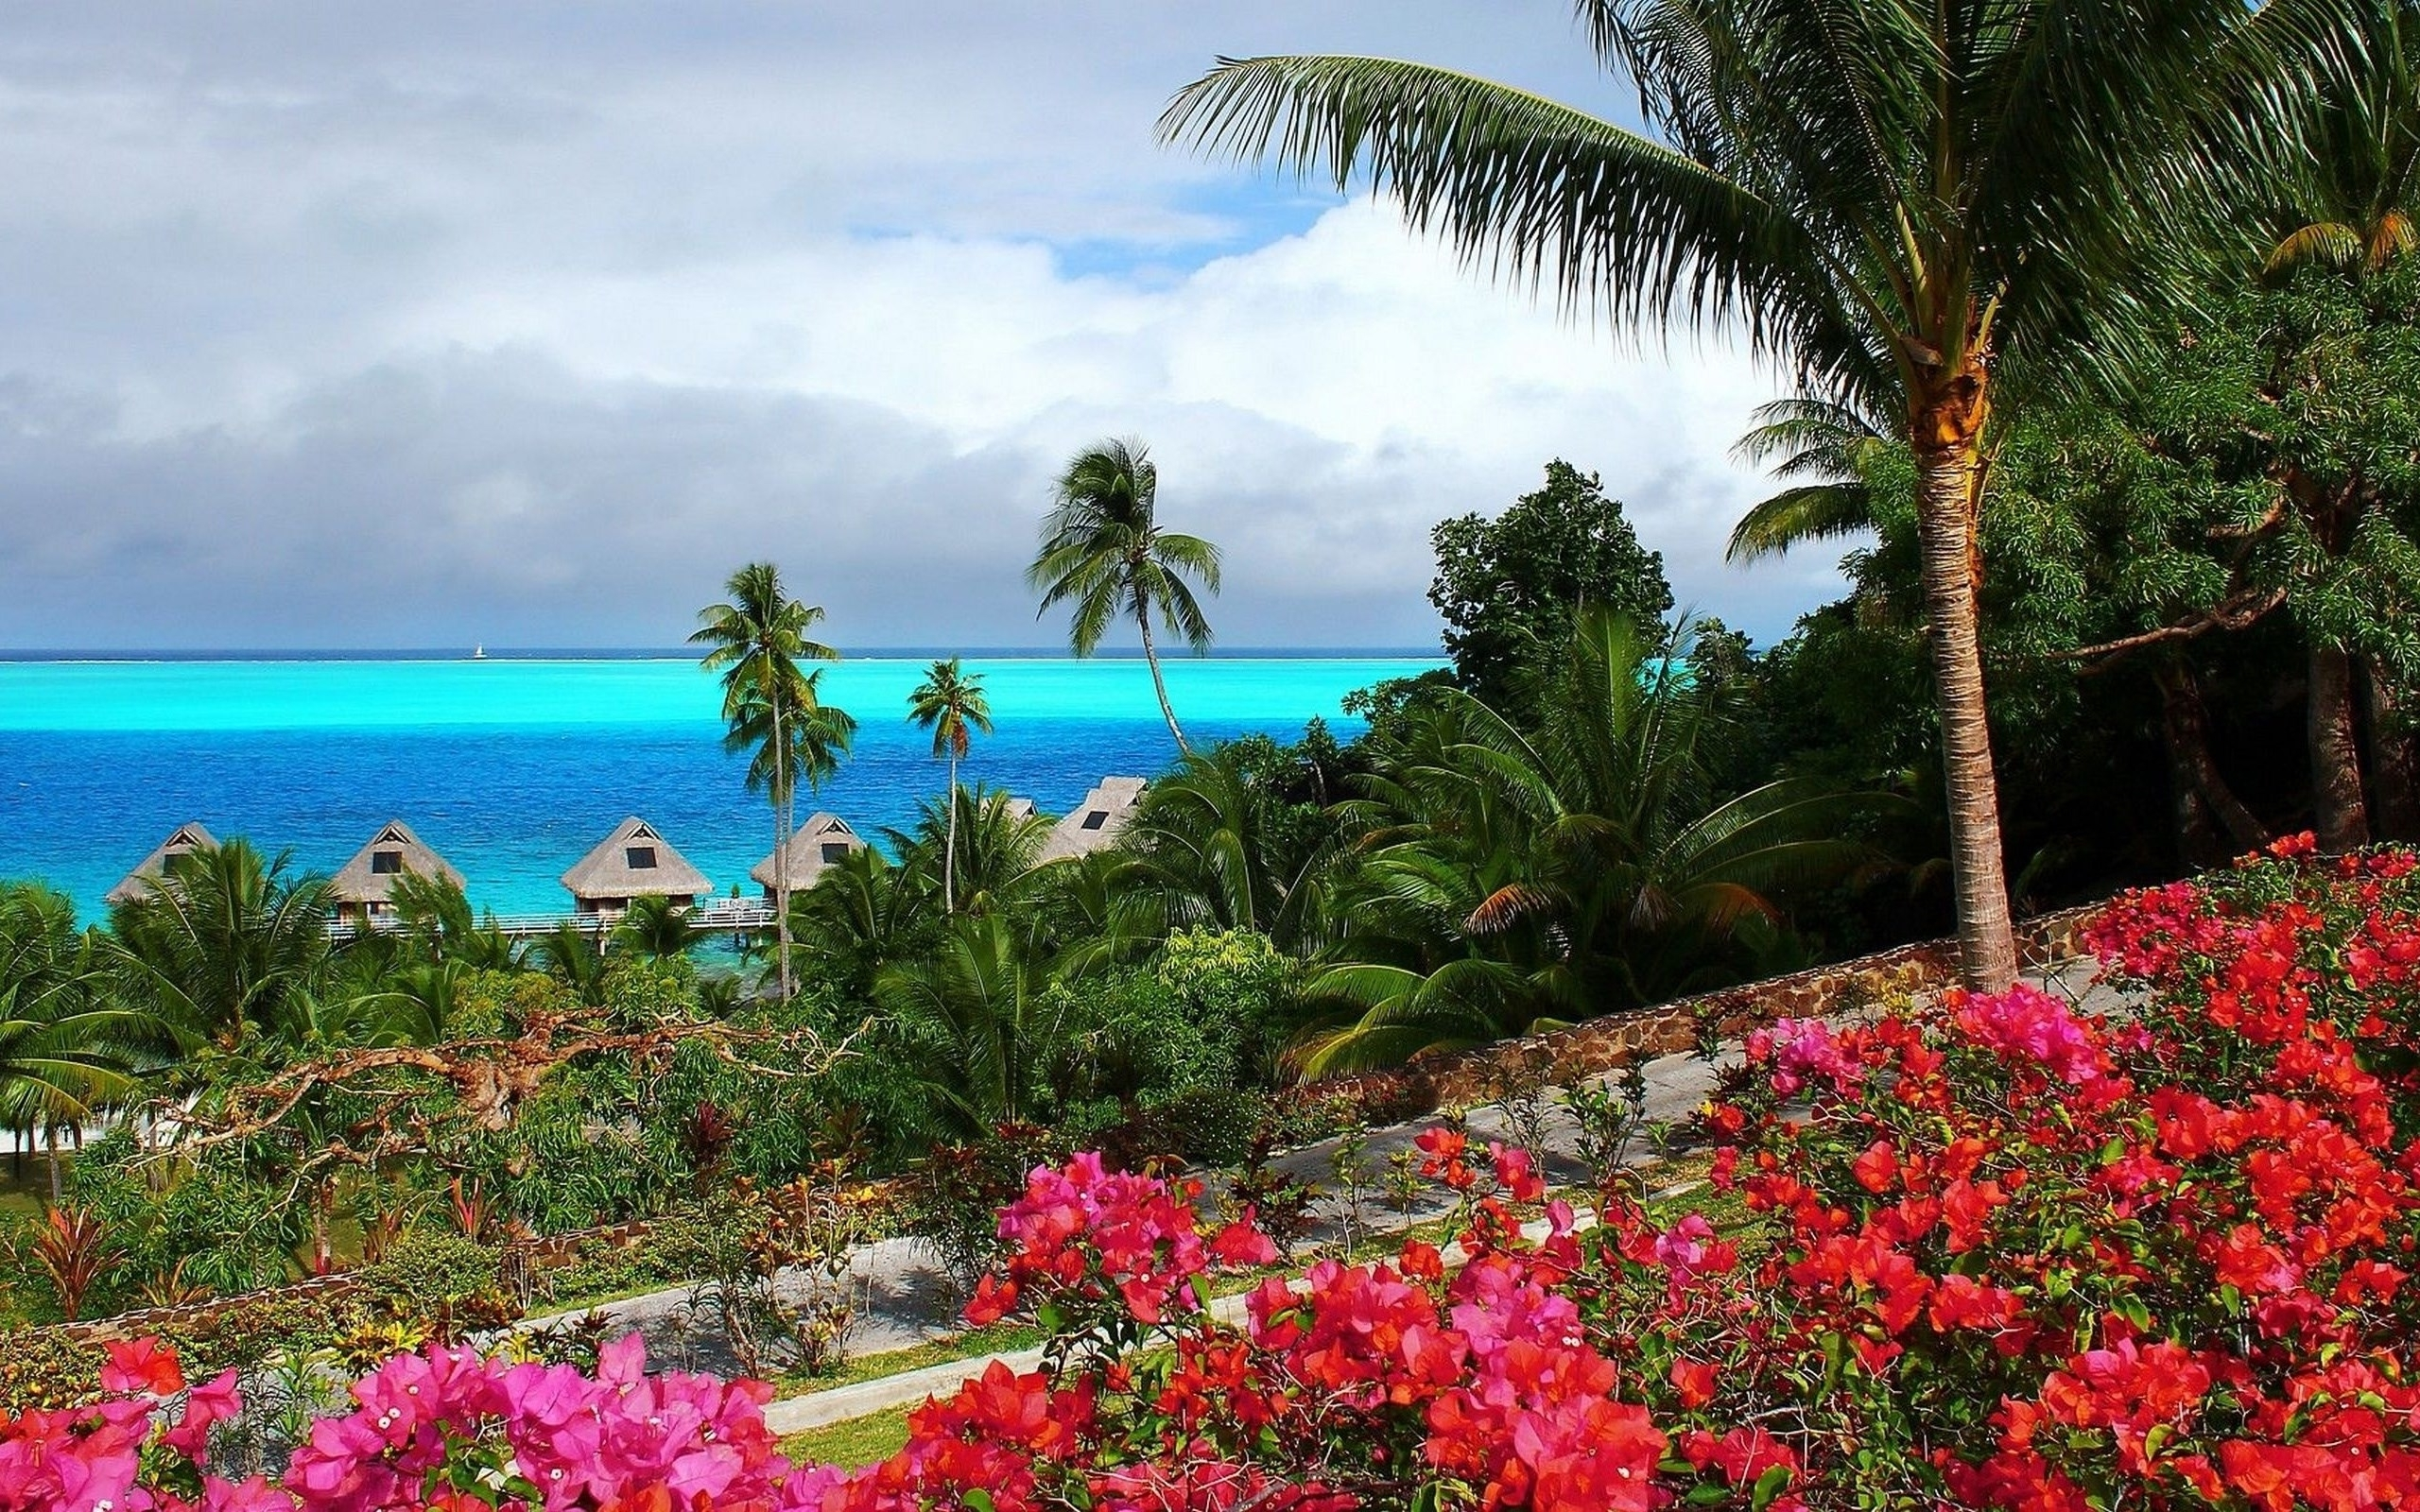 Tropical island wallpaper   1308772 2560x1600